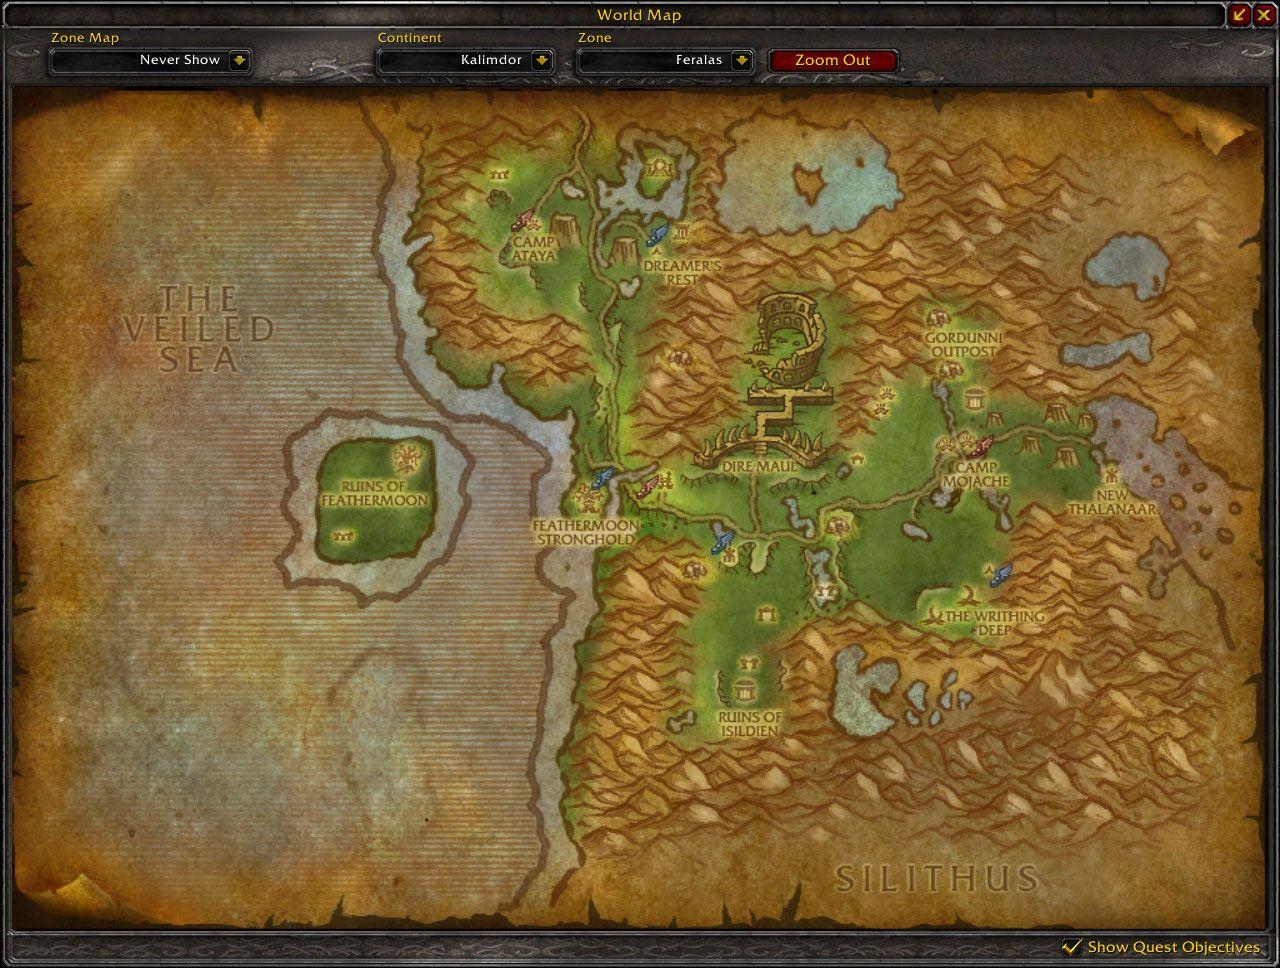 Feralas cataclysm map wow screenshot gamingcfg feralas cataclysm map wow screenshot gumiabroncs Choice Image